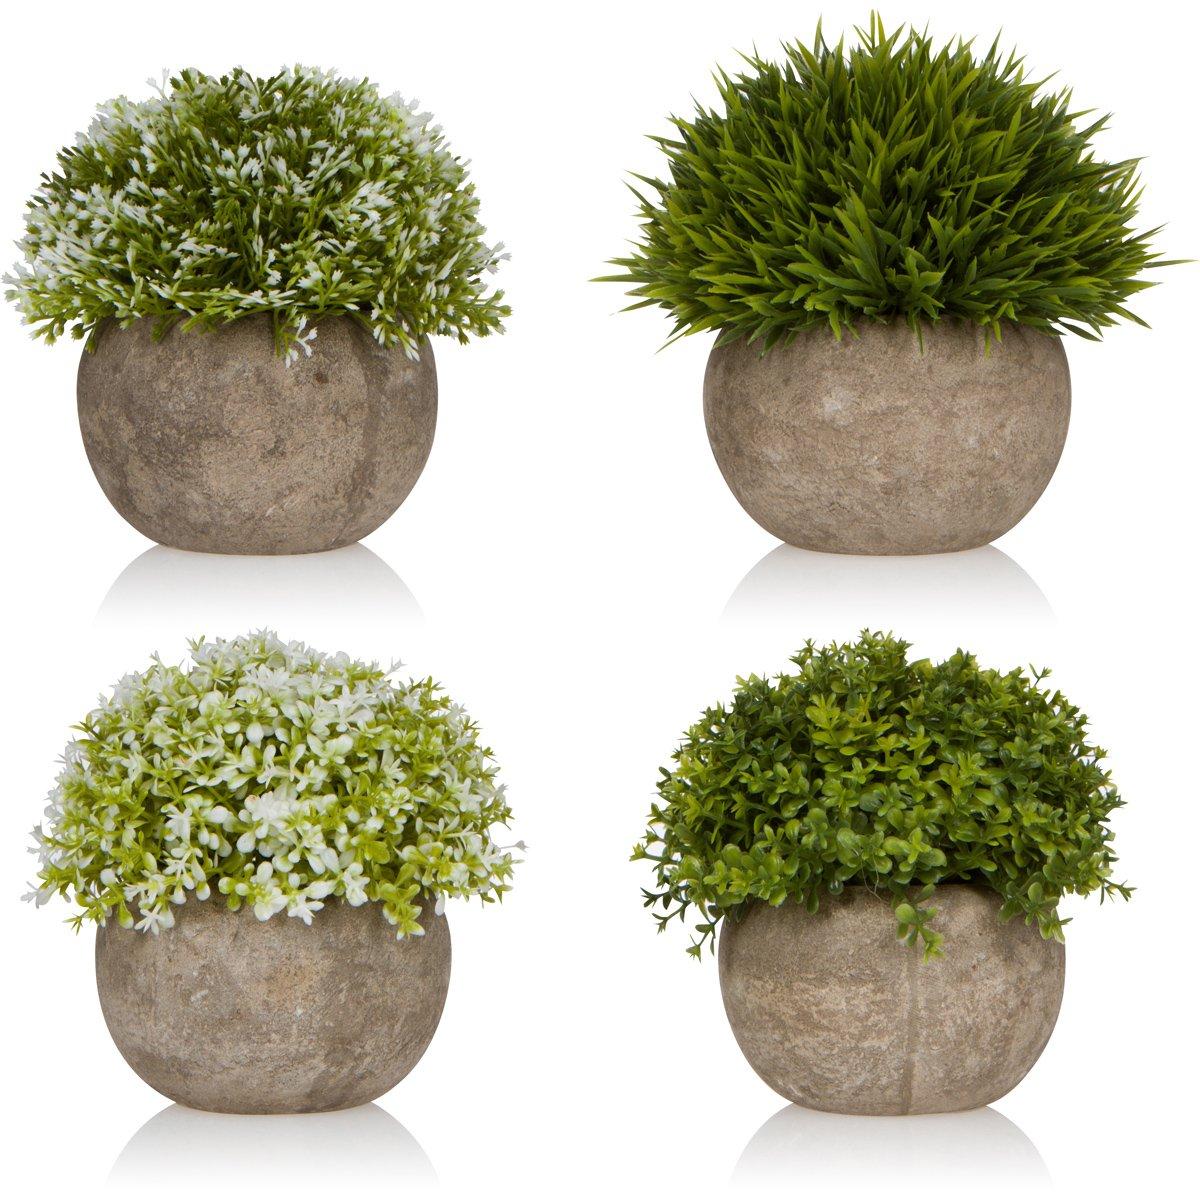 West Dwelling Mini Potted Plants - Small Fake Artificial Succulents For Decoration - Office Desk Home Succulent Plant Decor - Round Pots - Set of 4